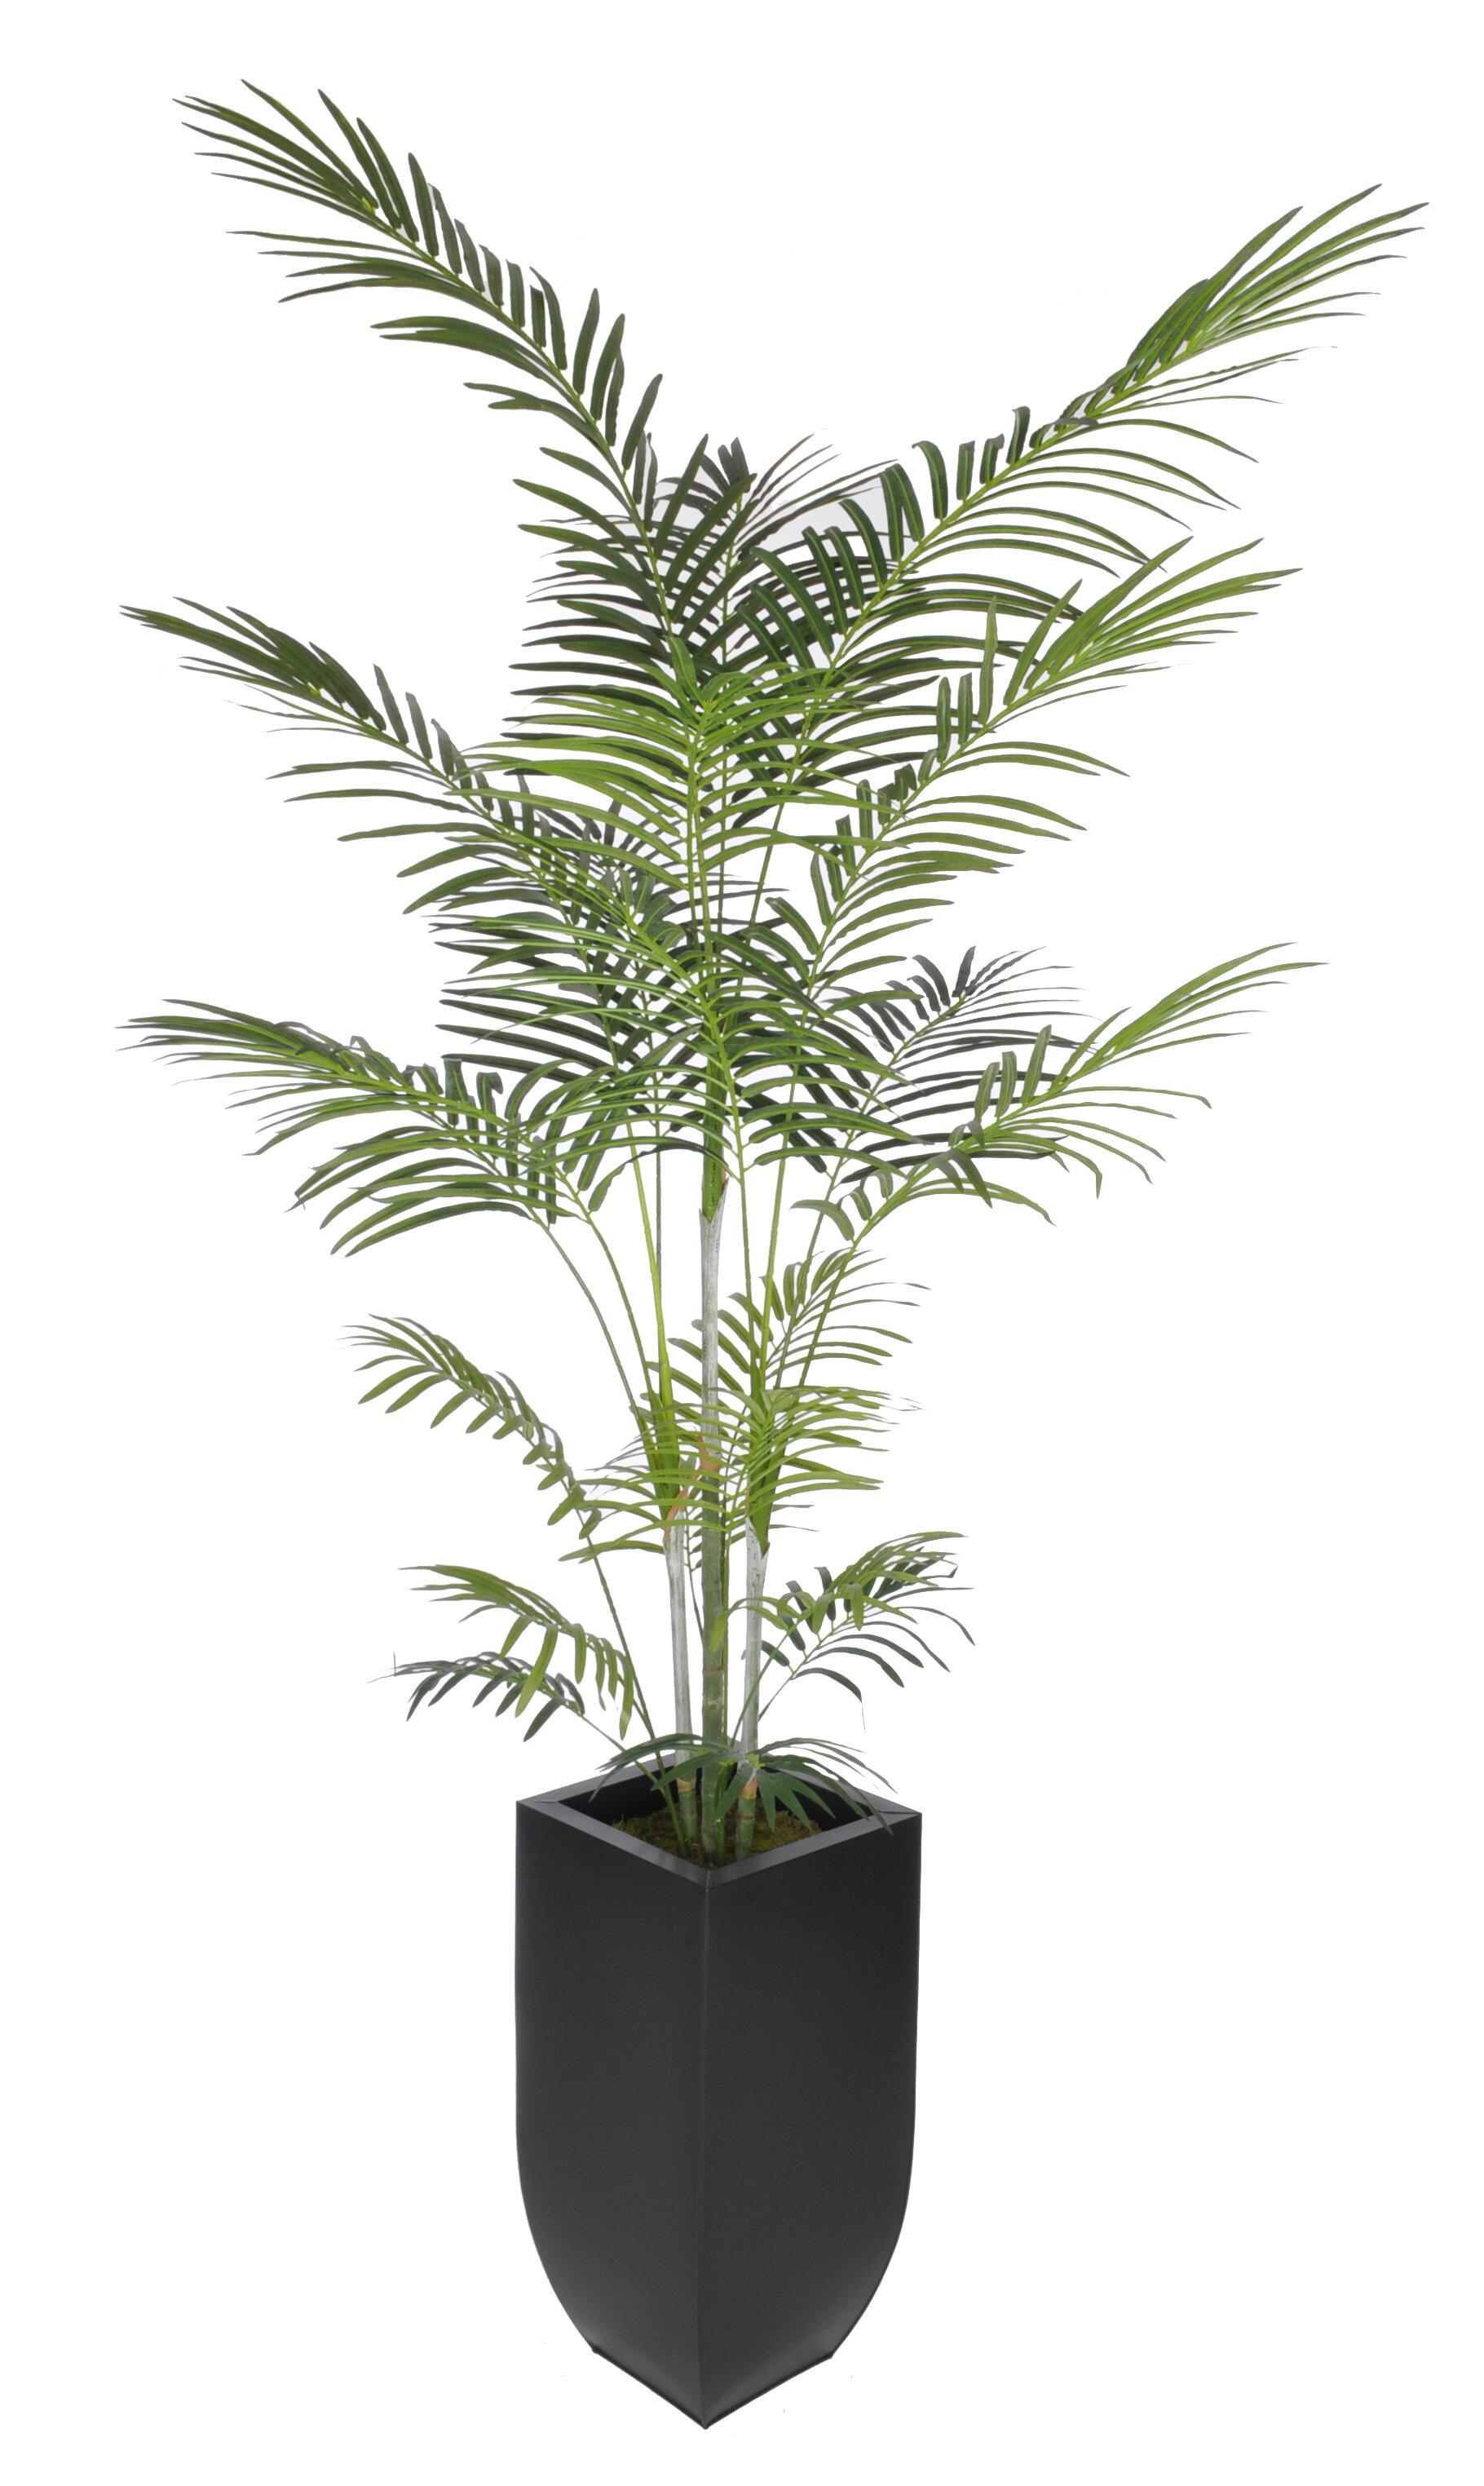 Beachcrest Home Artificial Areca Palm Tree Floor Plant In Planter